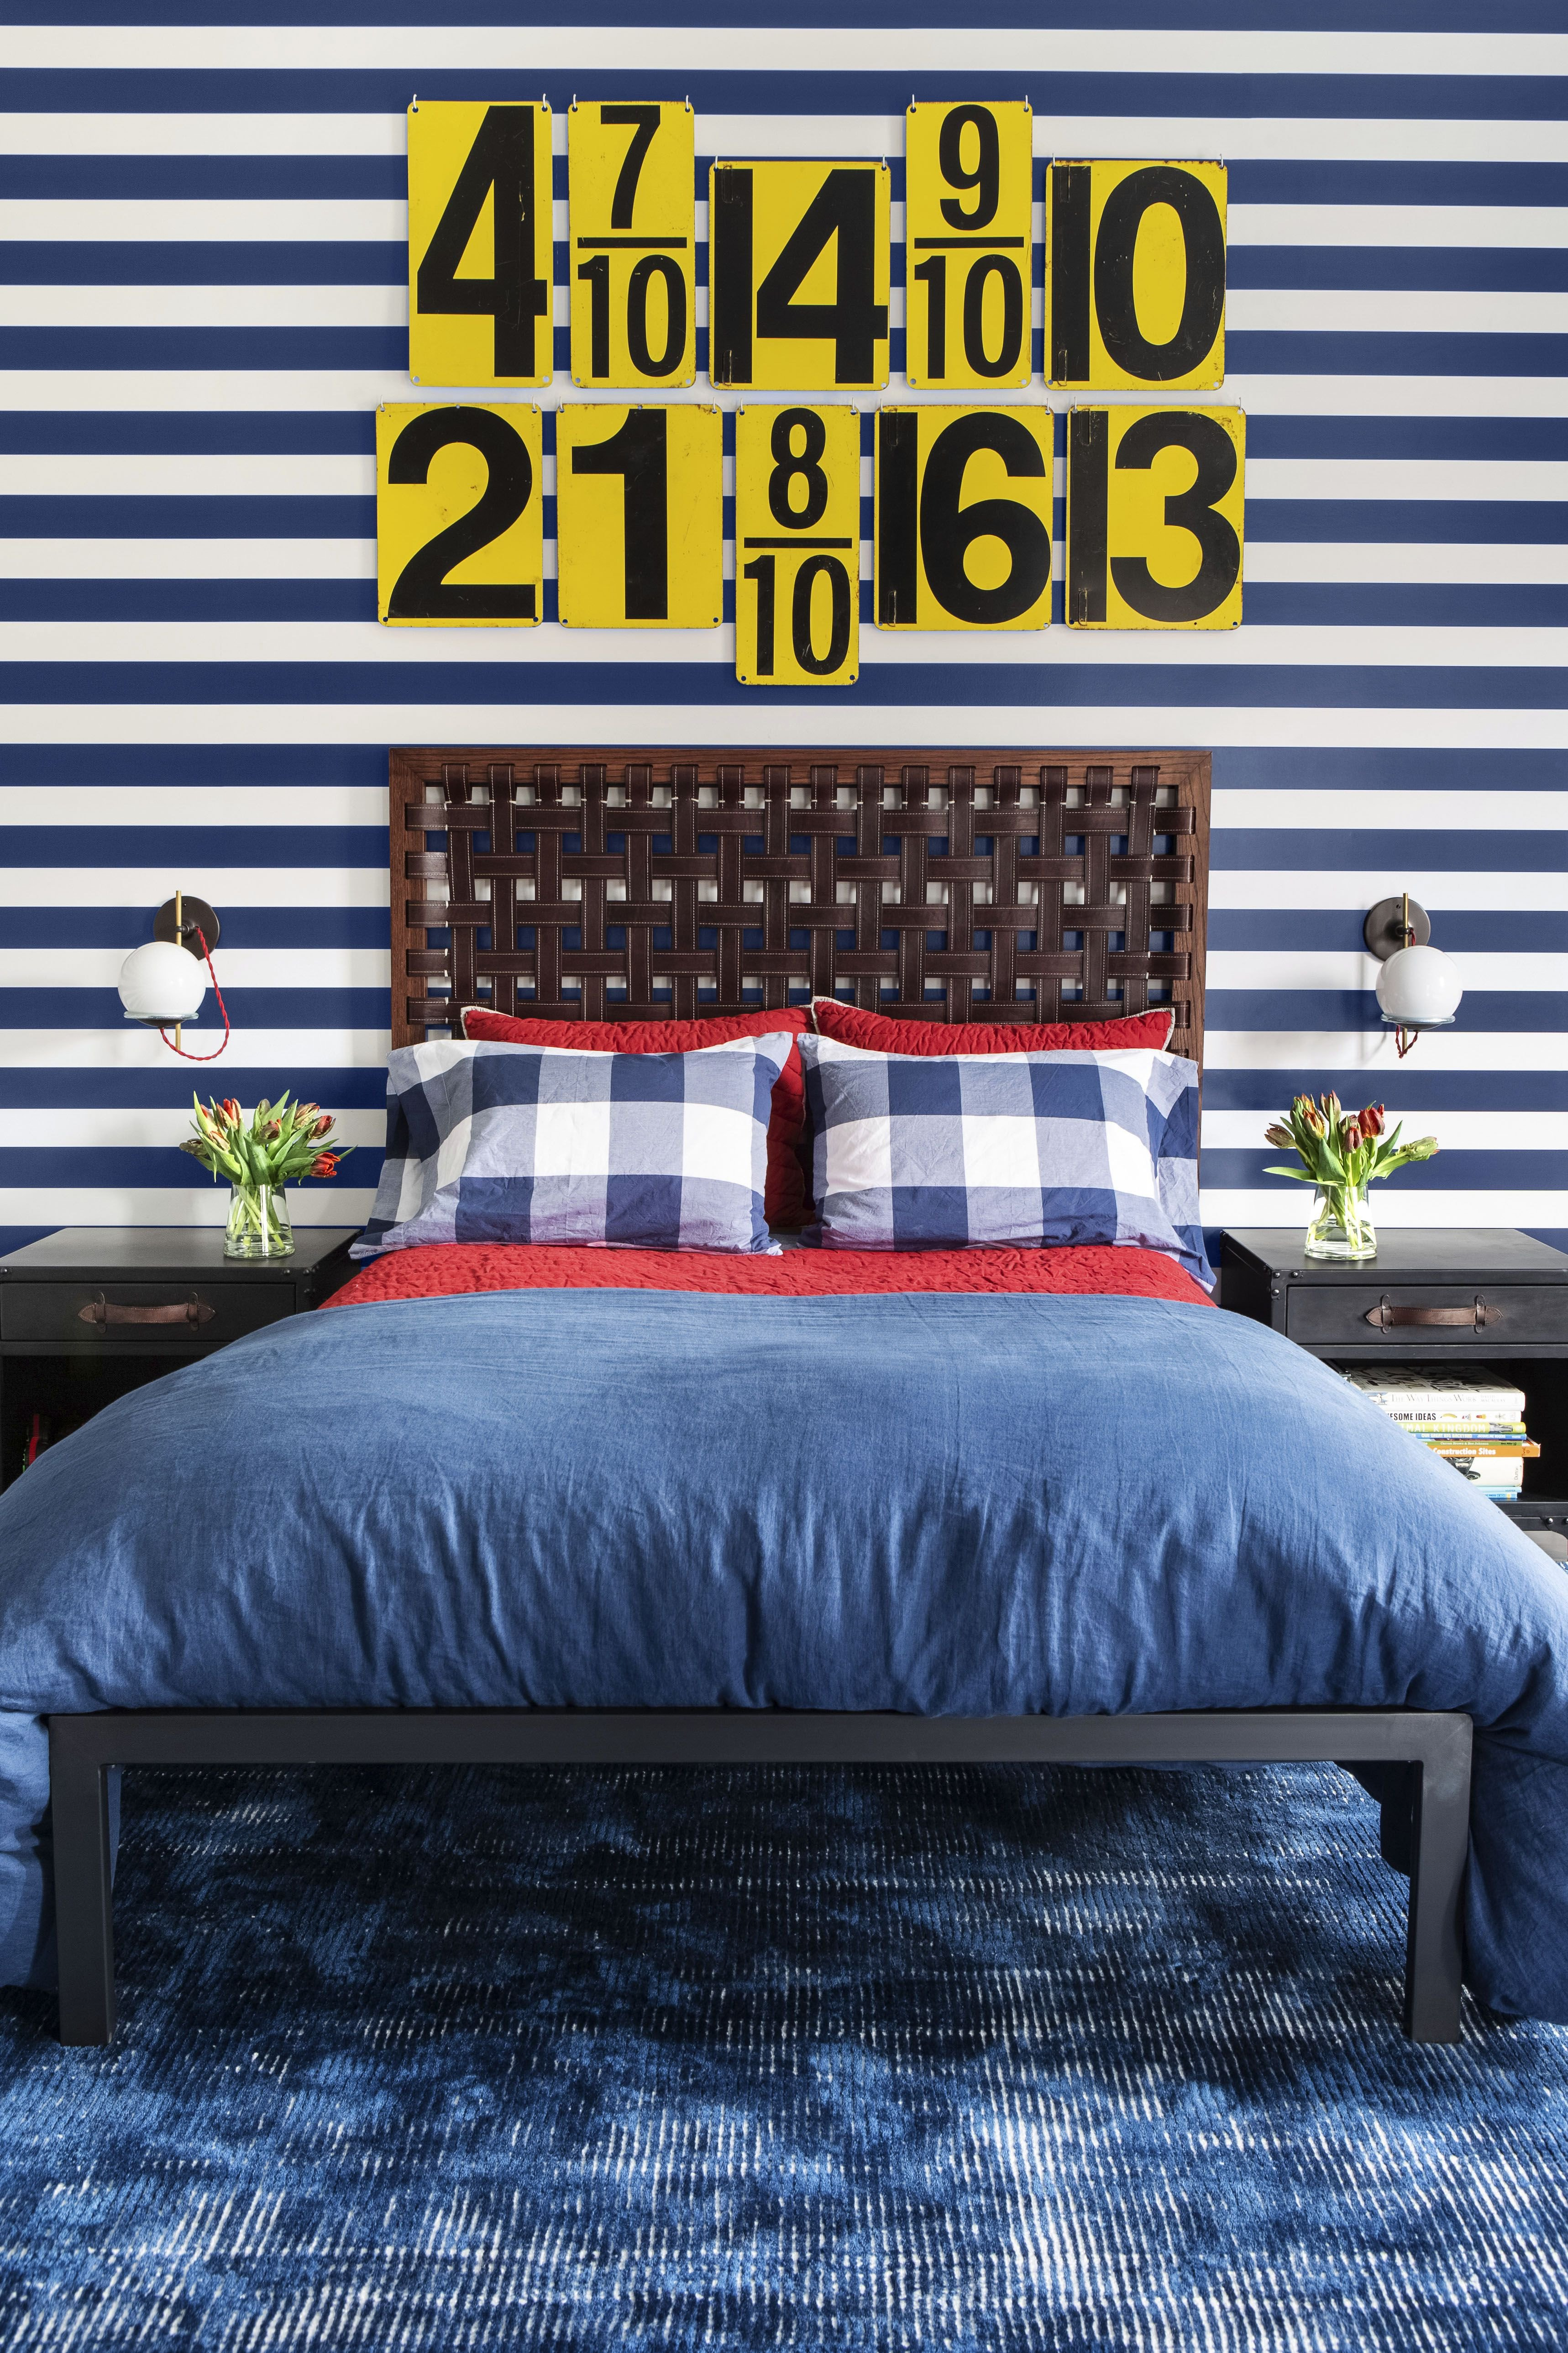 Navy Blue and Yellow Bedroom Luxury 30 Best Kids Room Ideas Diy Boys and Girls Bedroom